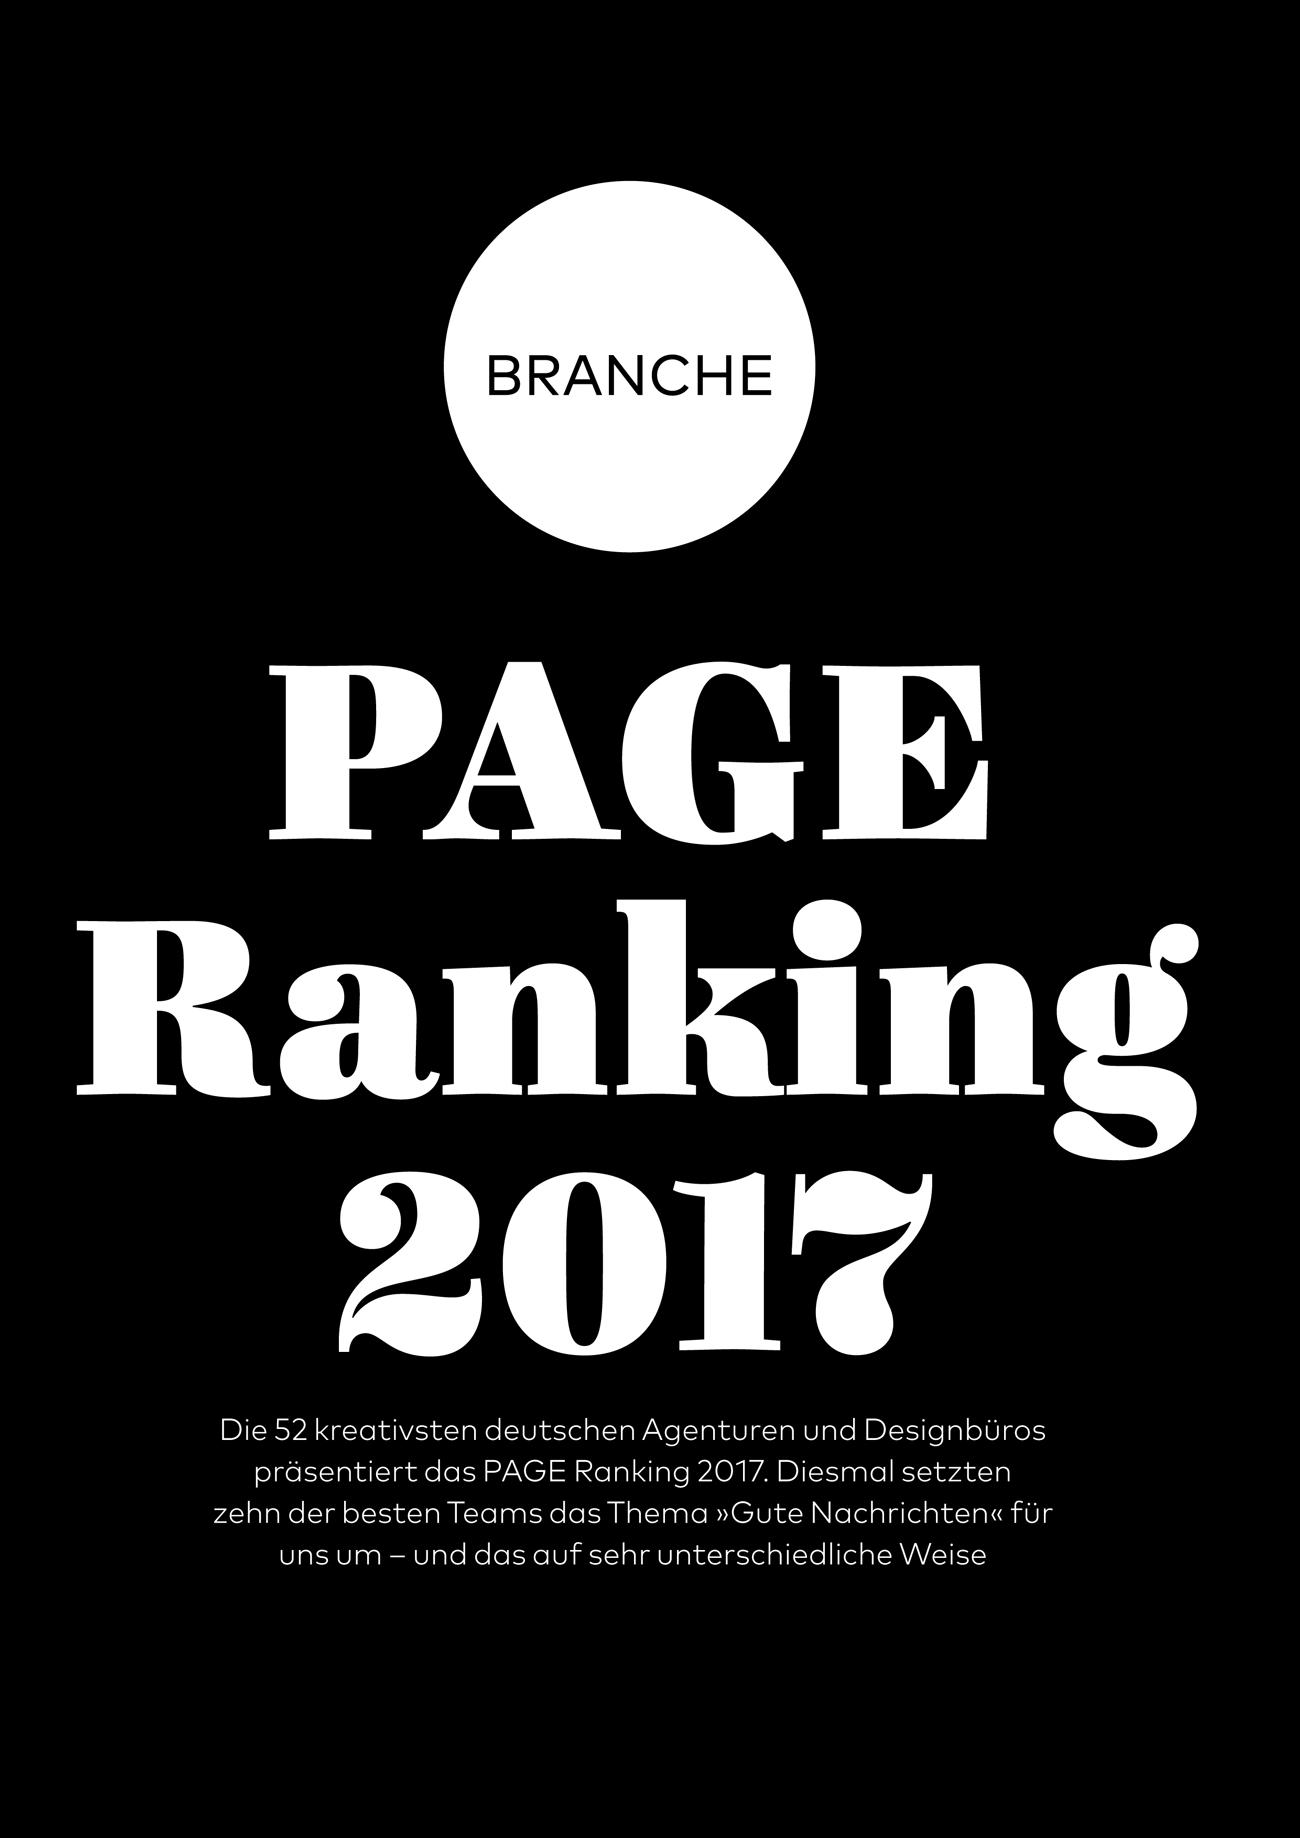 page-ranking-2017-artikelbild